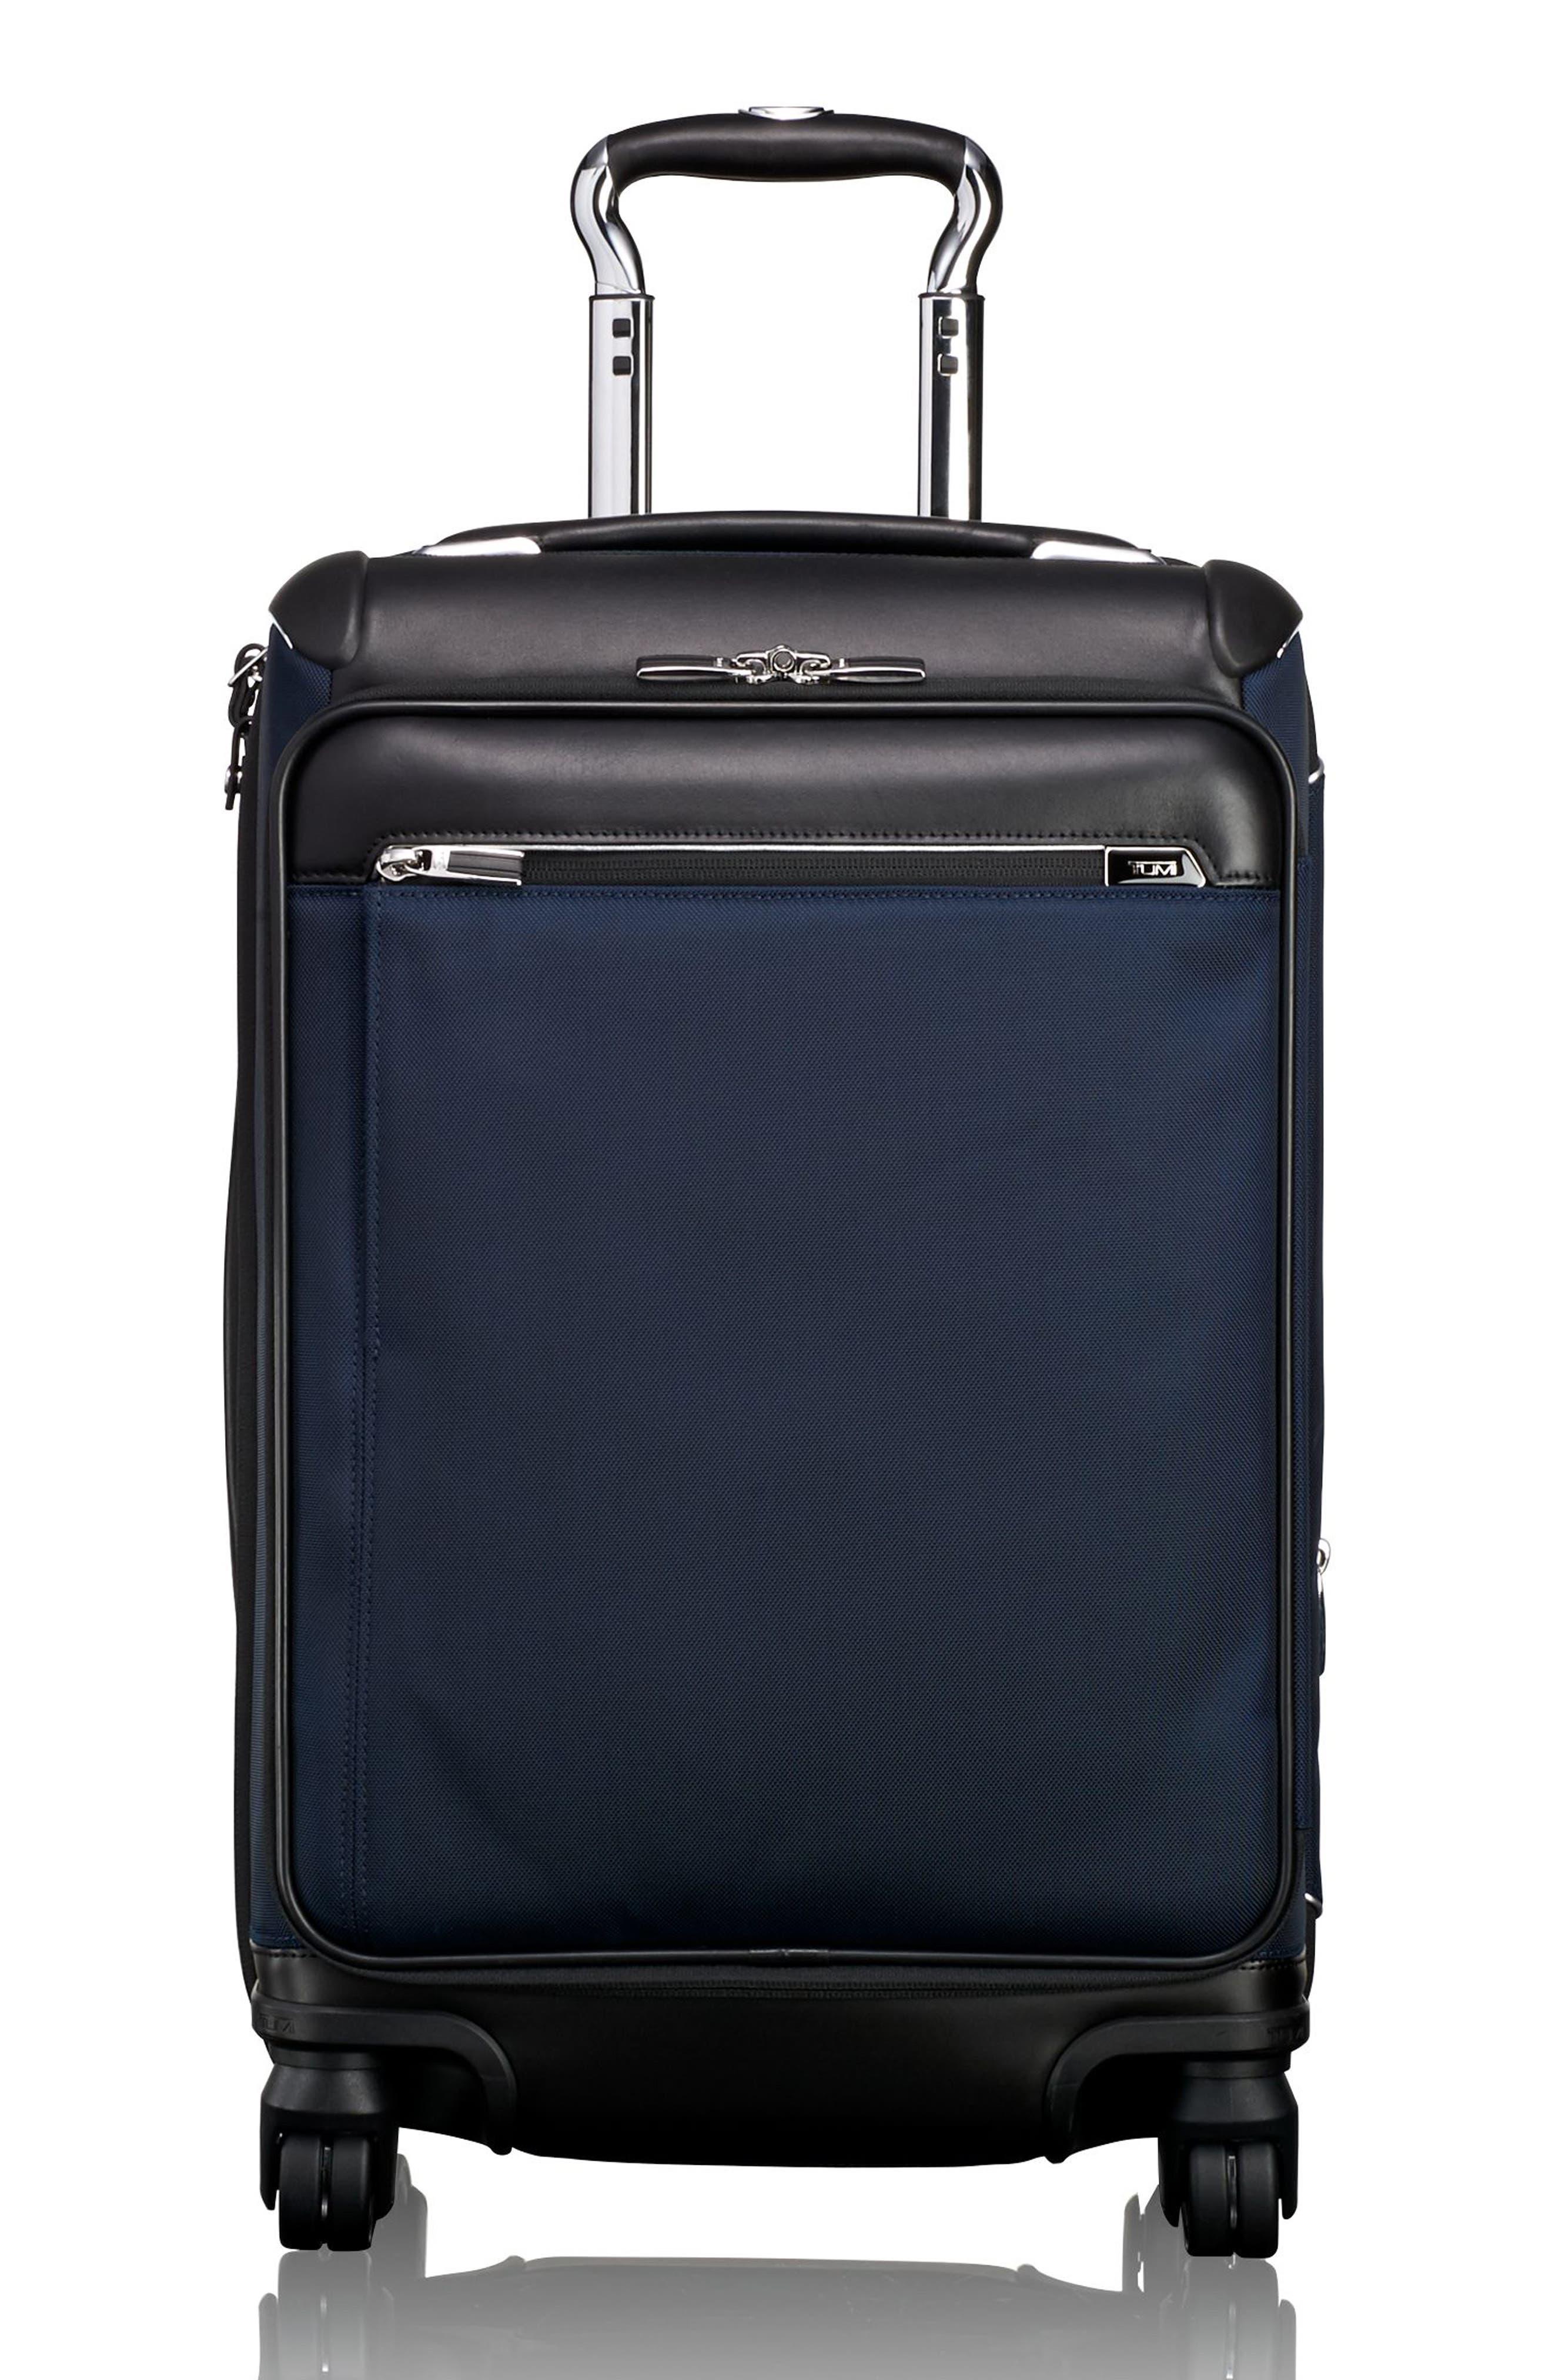 Tumi Gatwick 22 Inch International Expandable Carry-On